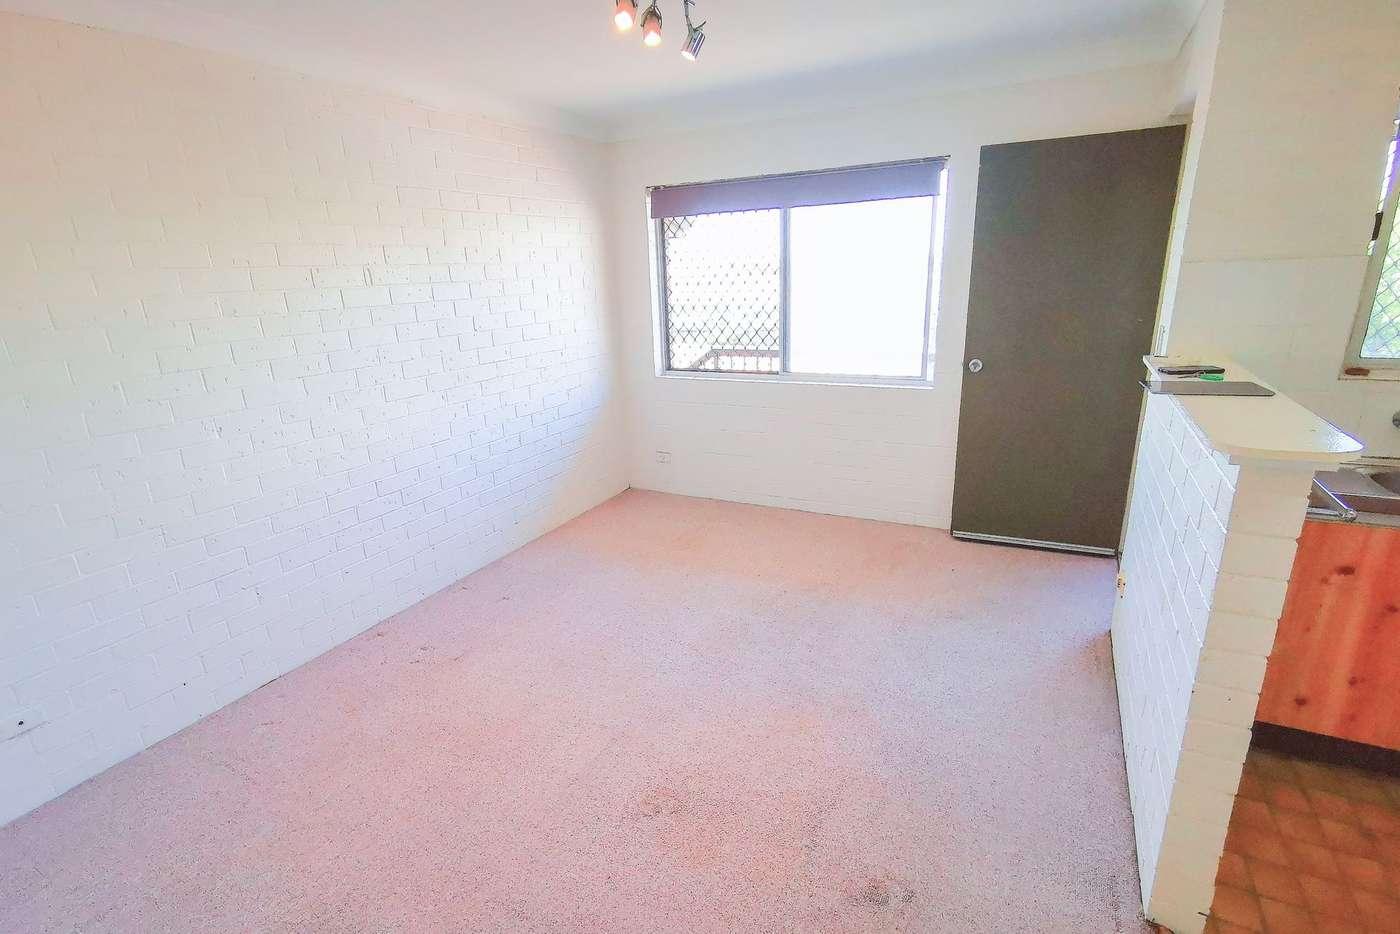 Sixth view of Homely unit listing, 15/6 High Street, Mount Gravatt QLD 4122